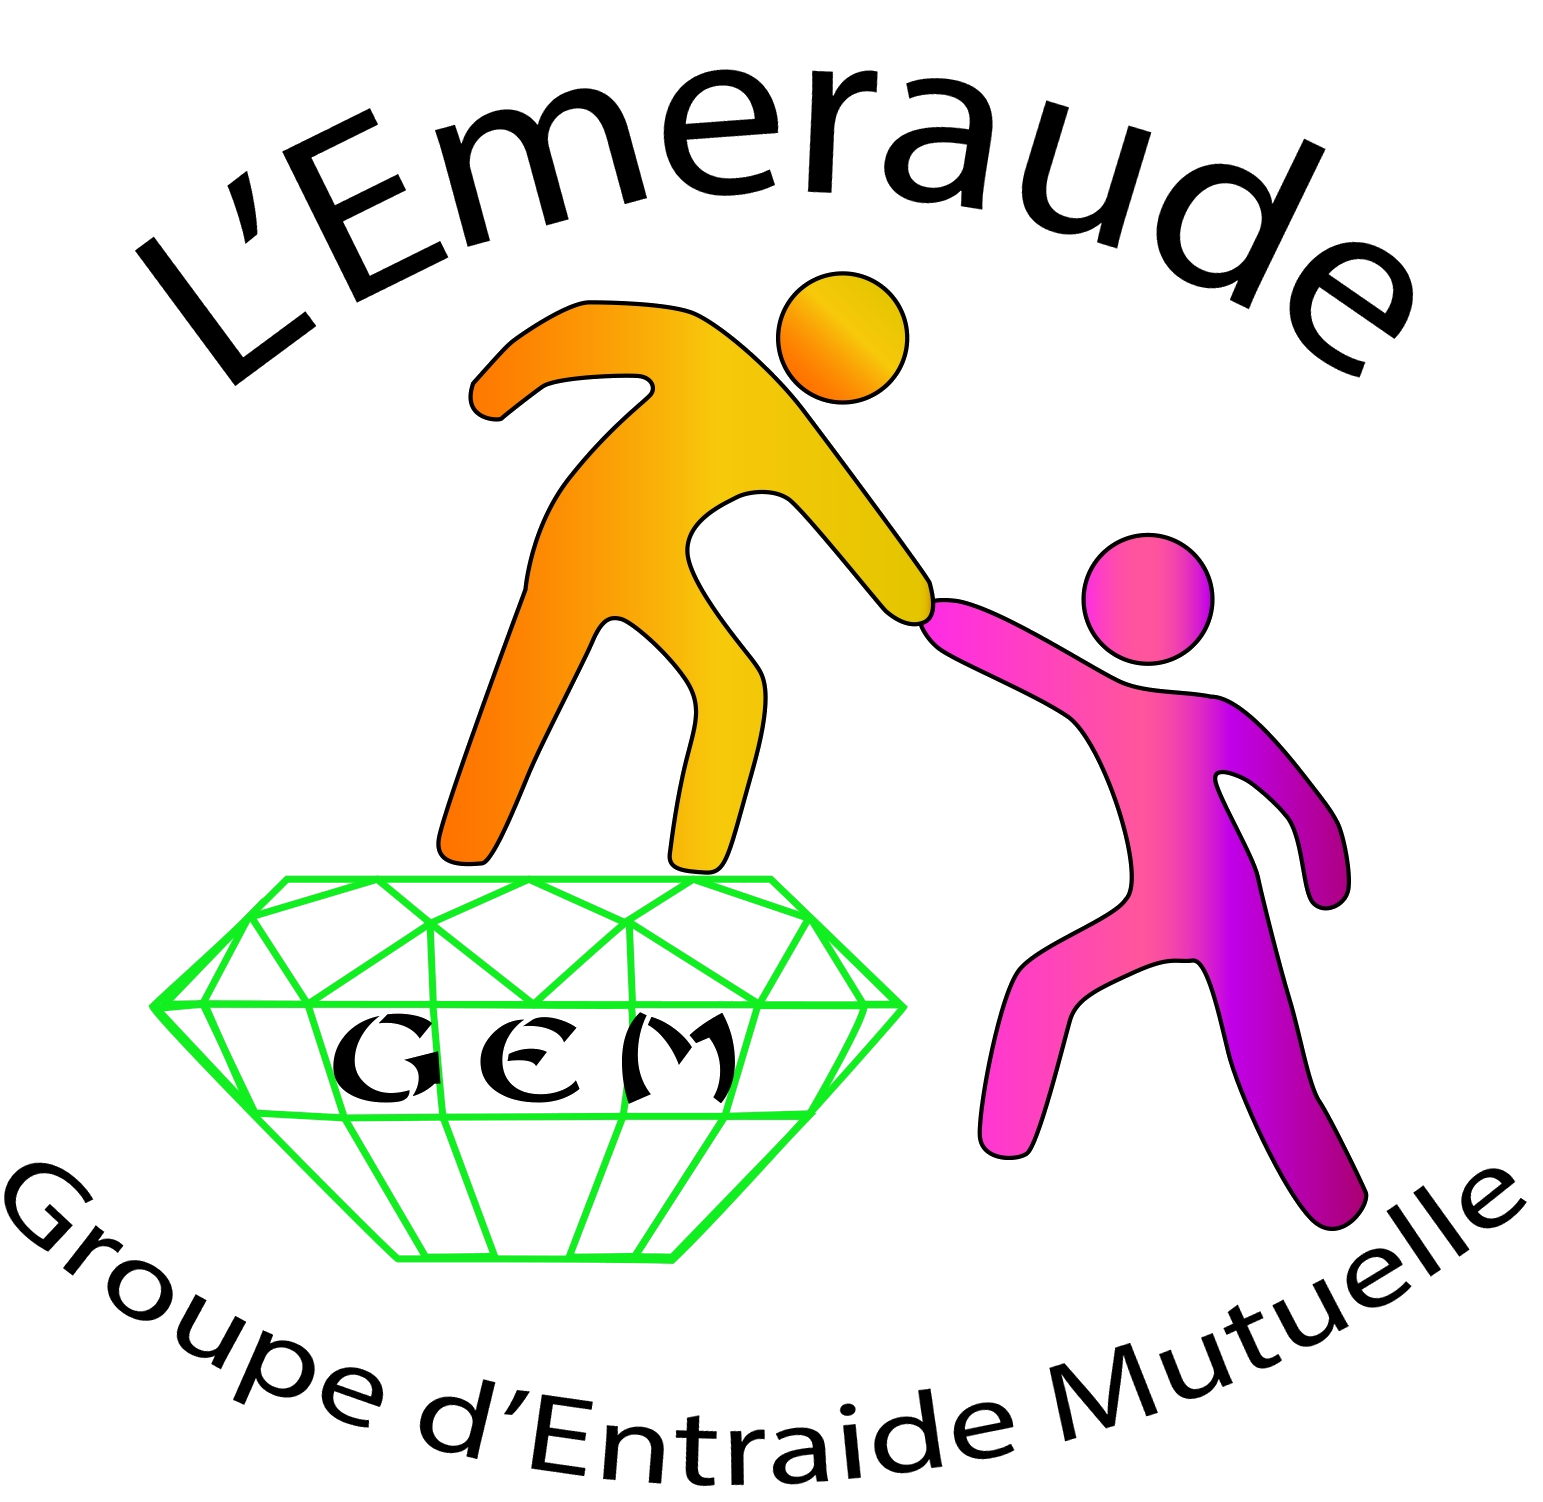 Gem Ales l'Emeraude Groupe d'entraide mutuelle Gard